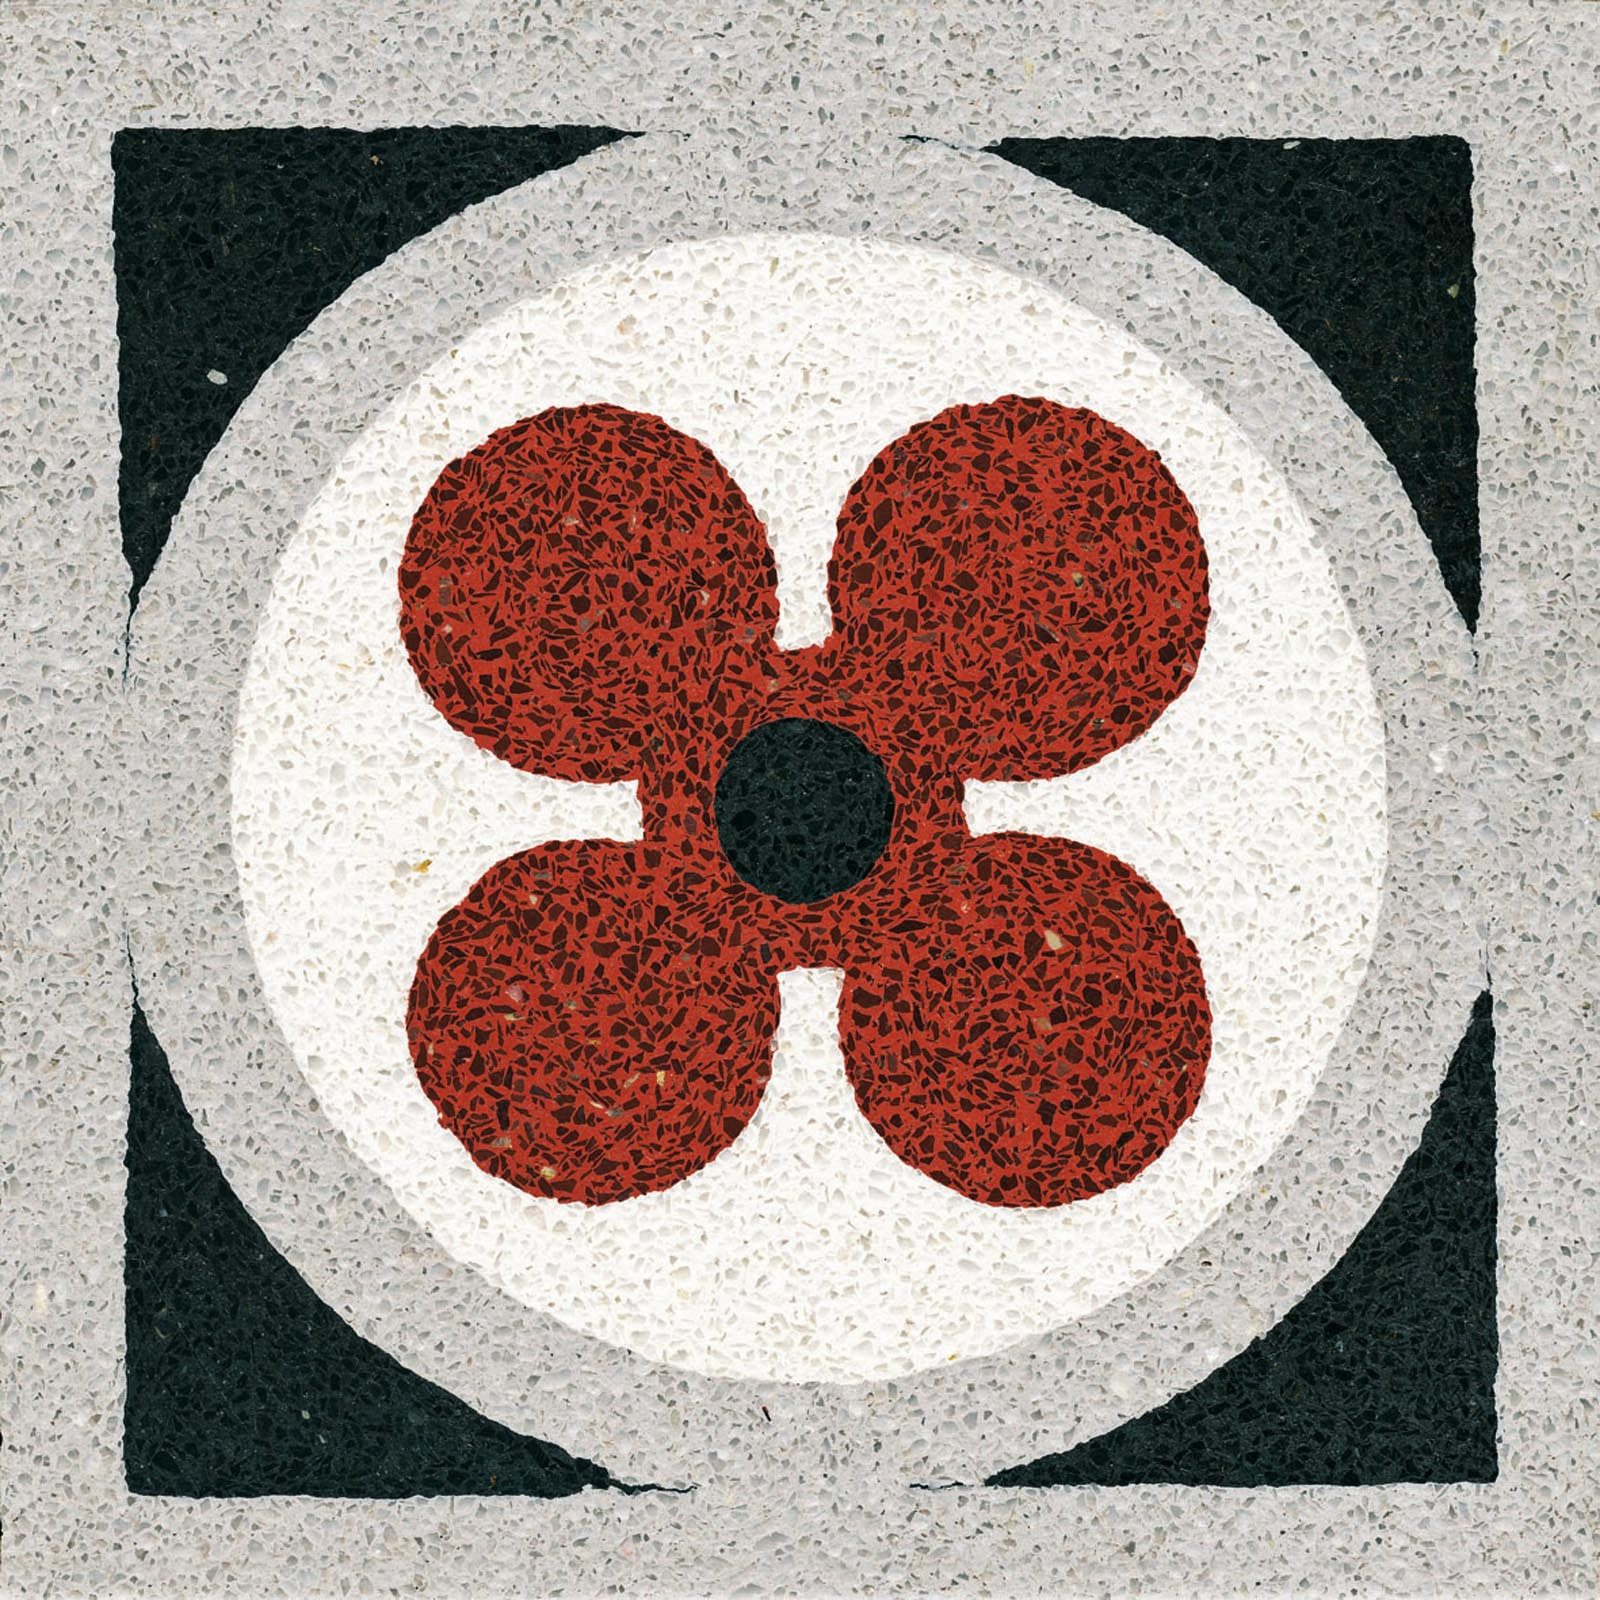 VIA Terrazzofliese mehrfarbig mit roter Blume